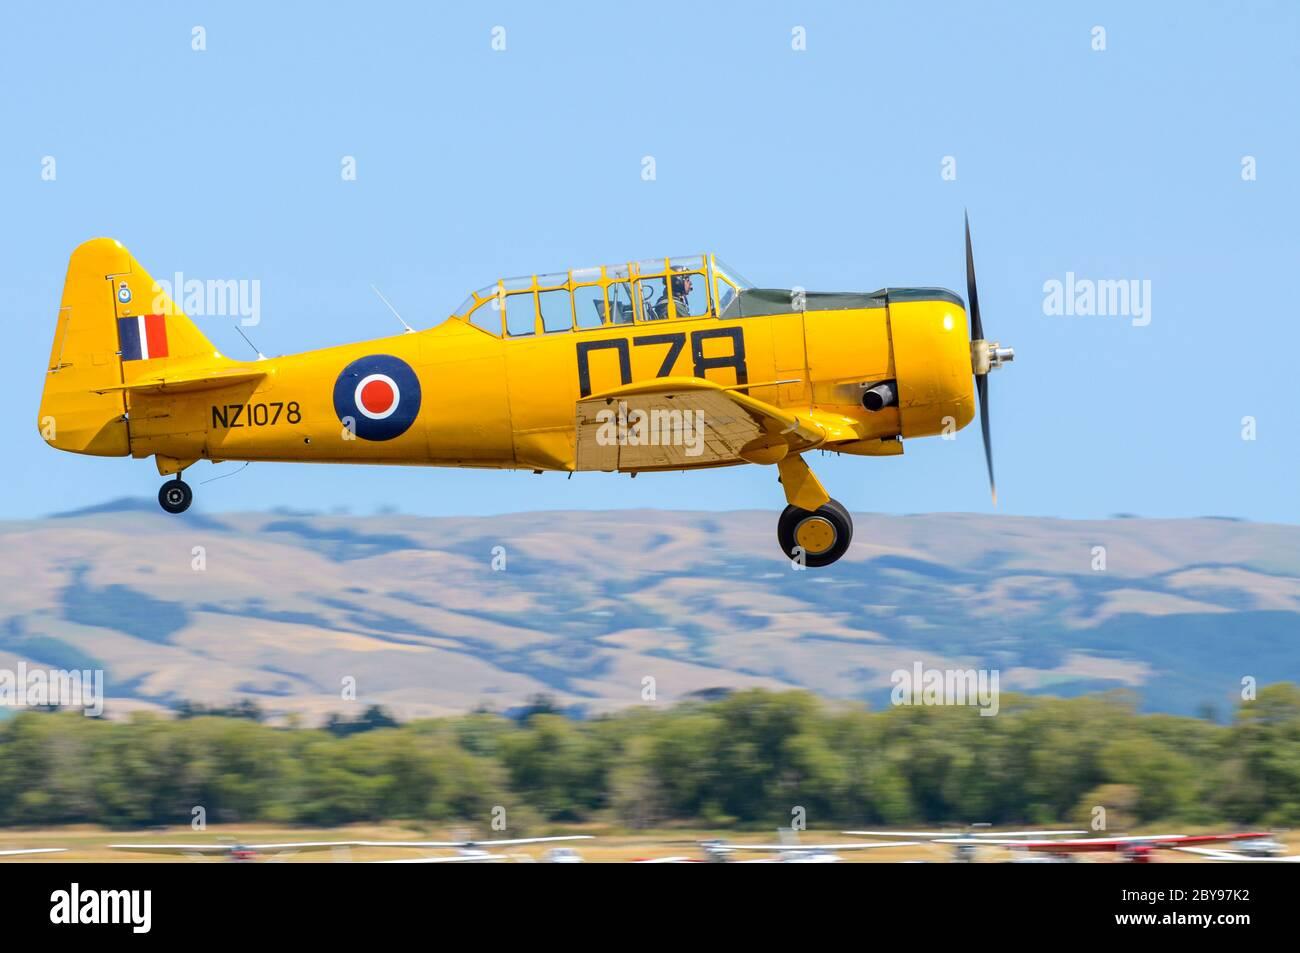 north-american-t-6-harvard-texan-second-world-war-training-plane-at-wings-over-wairarapa-airshow-hood-aerodrome-masterton-new-zealand-raf-yellow-2BY97K2.jpg